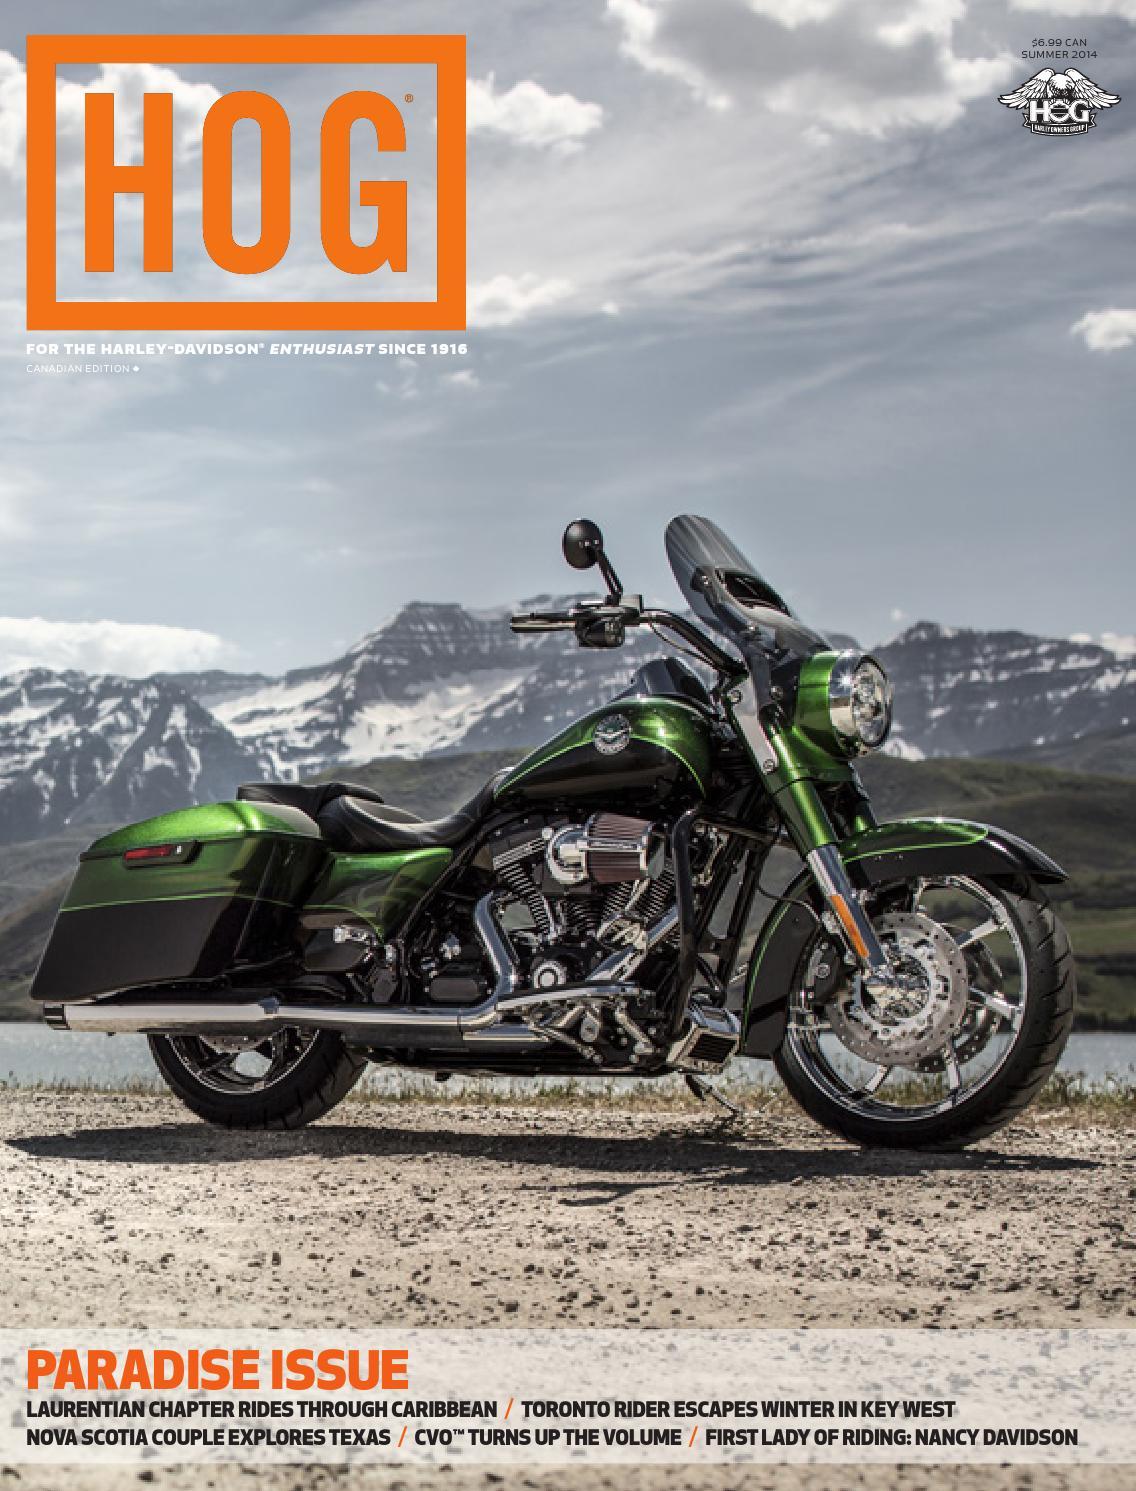 FTW letter Band Biker Motorcycle Ring Outlaw Cross Skull Harley 7-14